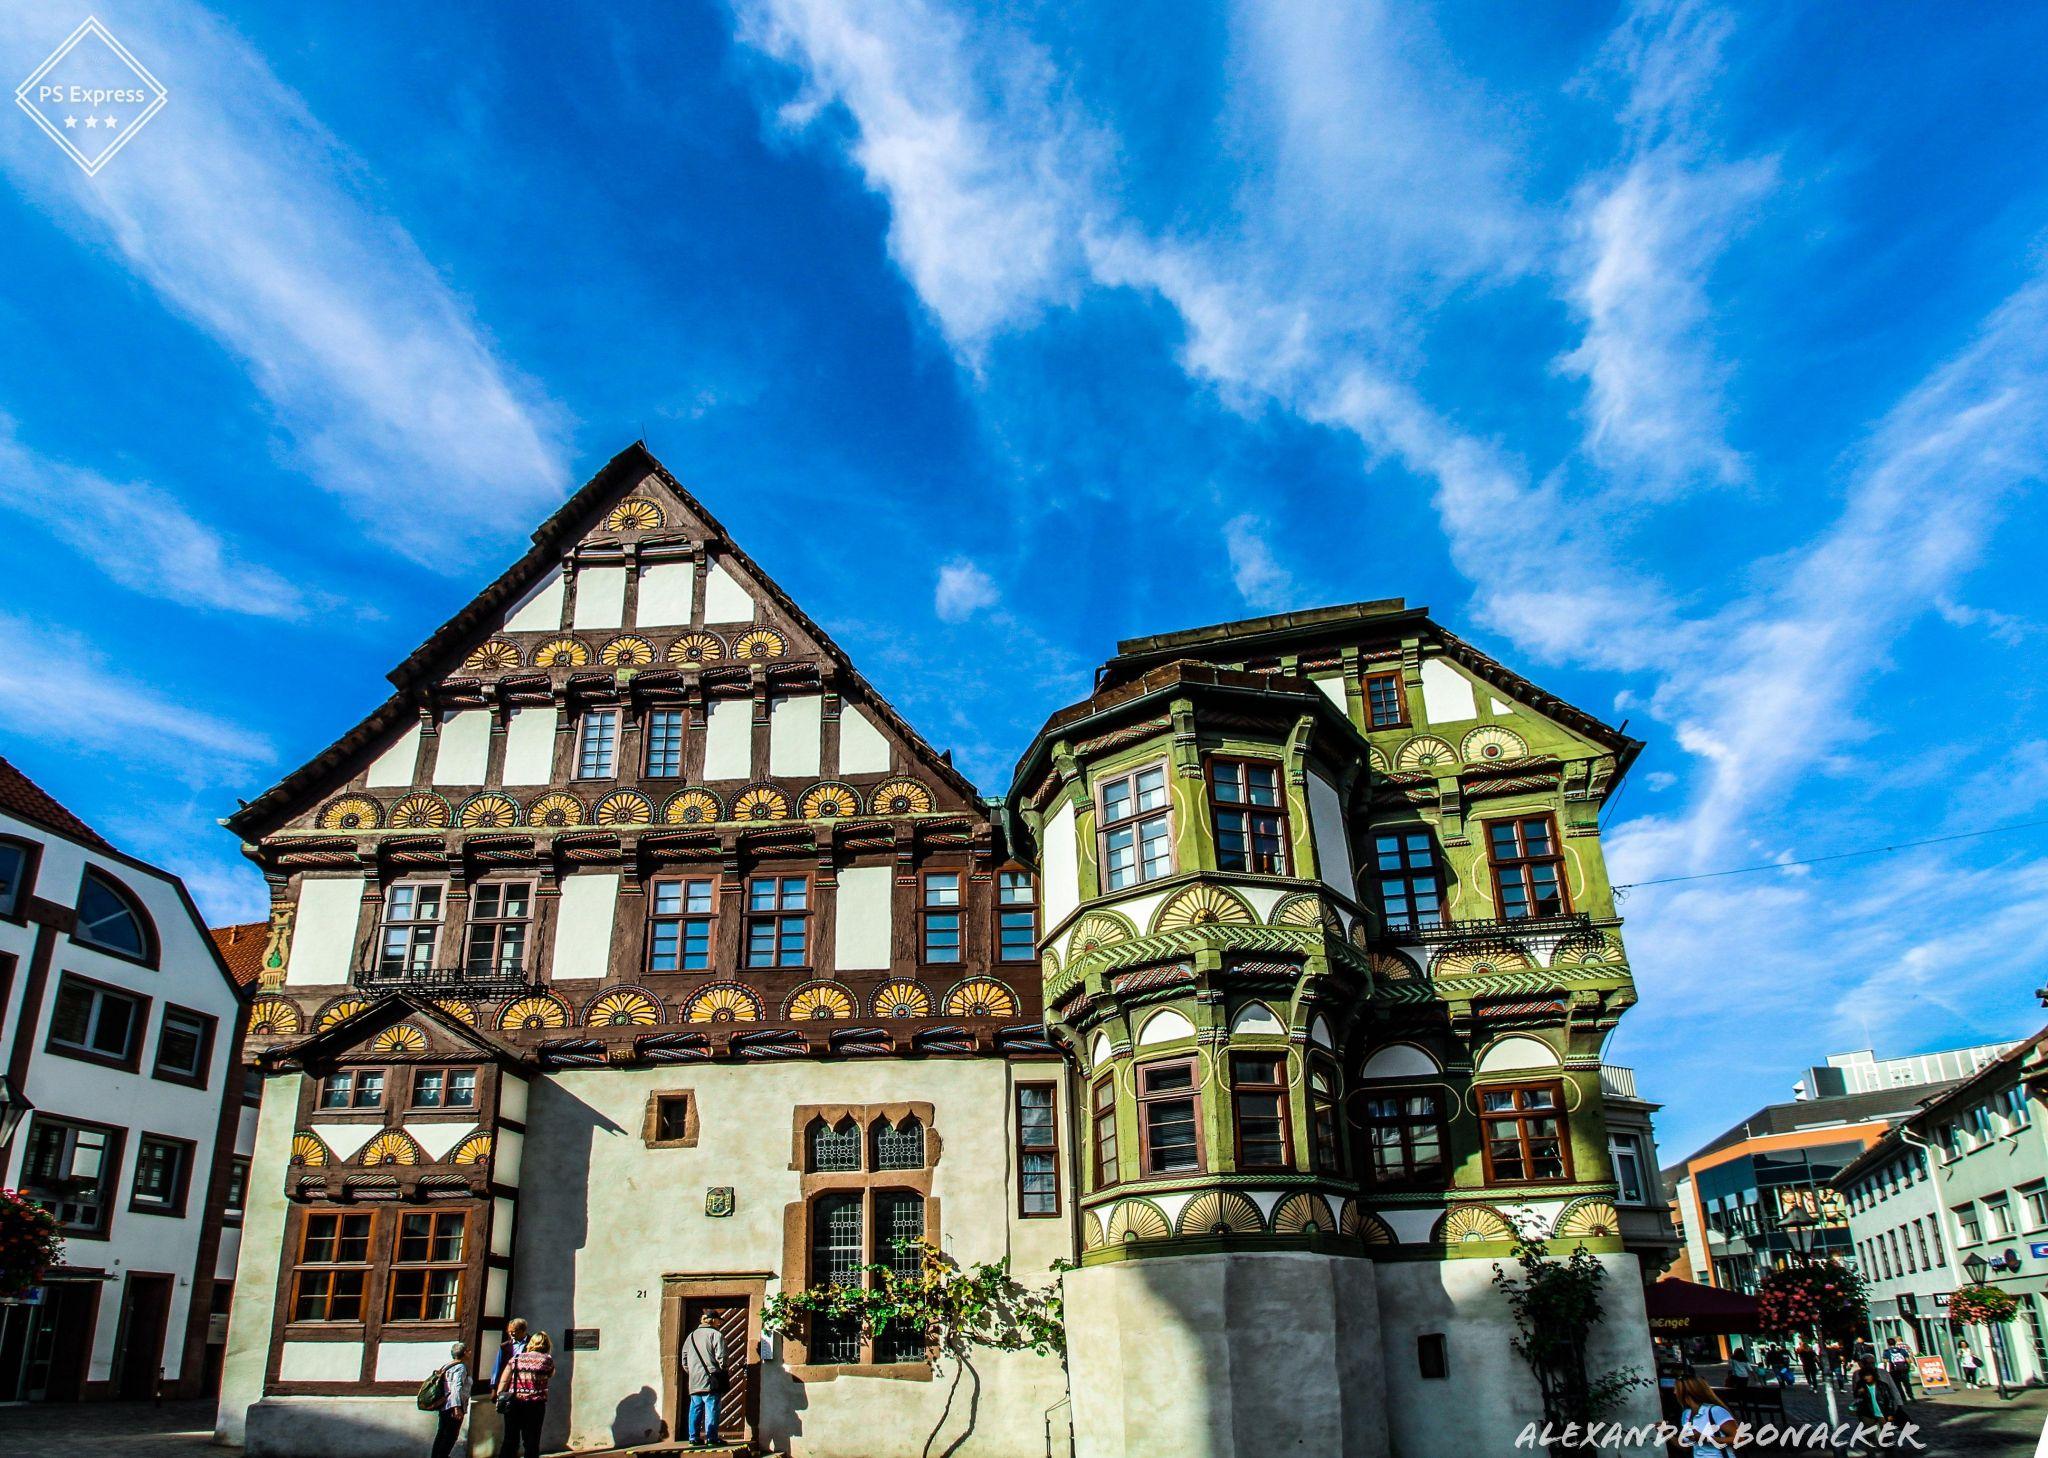 Höxter Dechanei, Germany